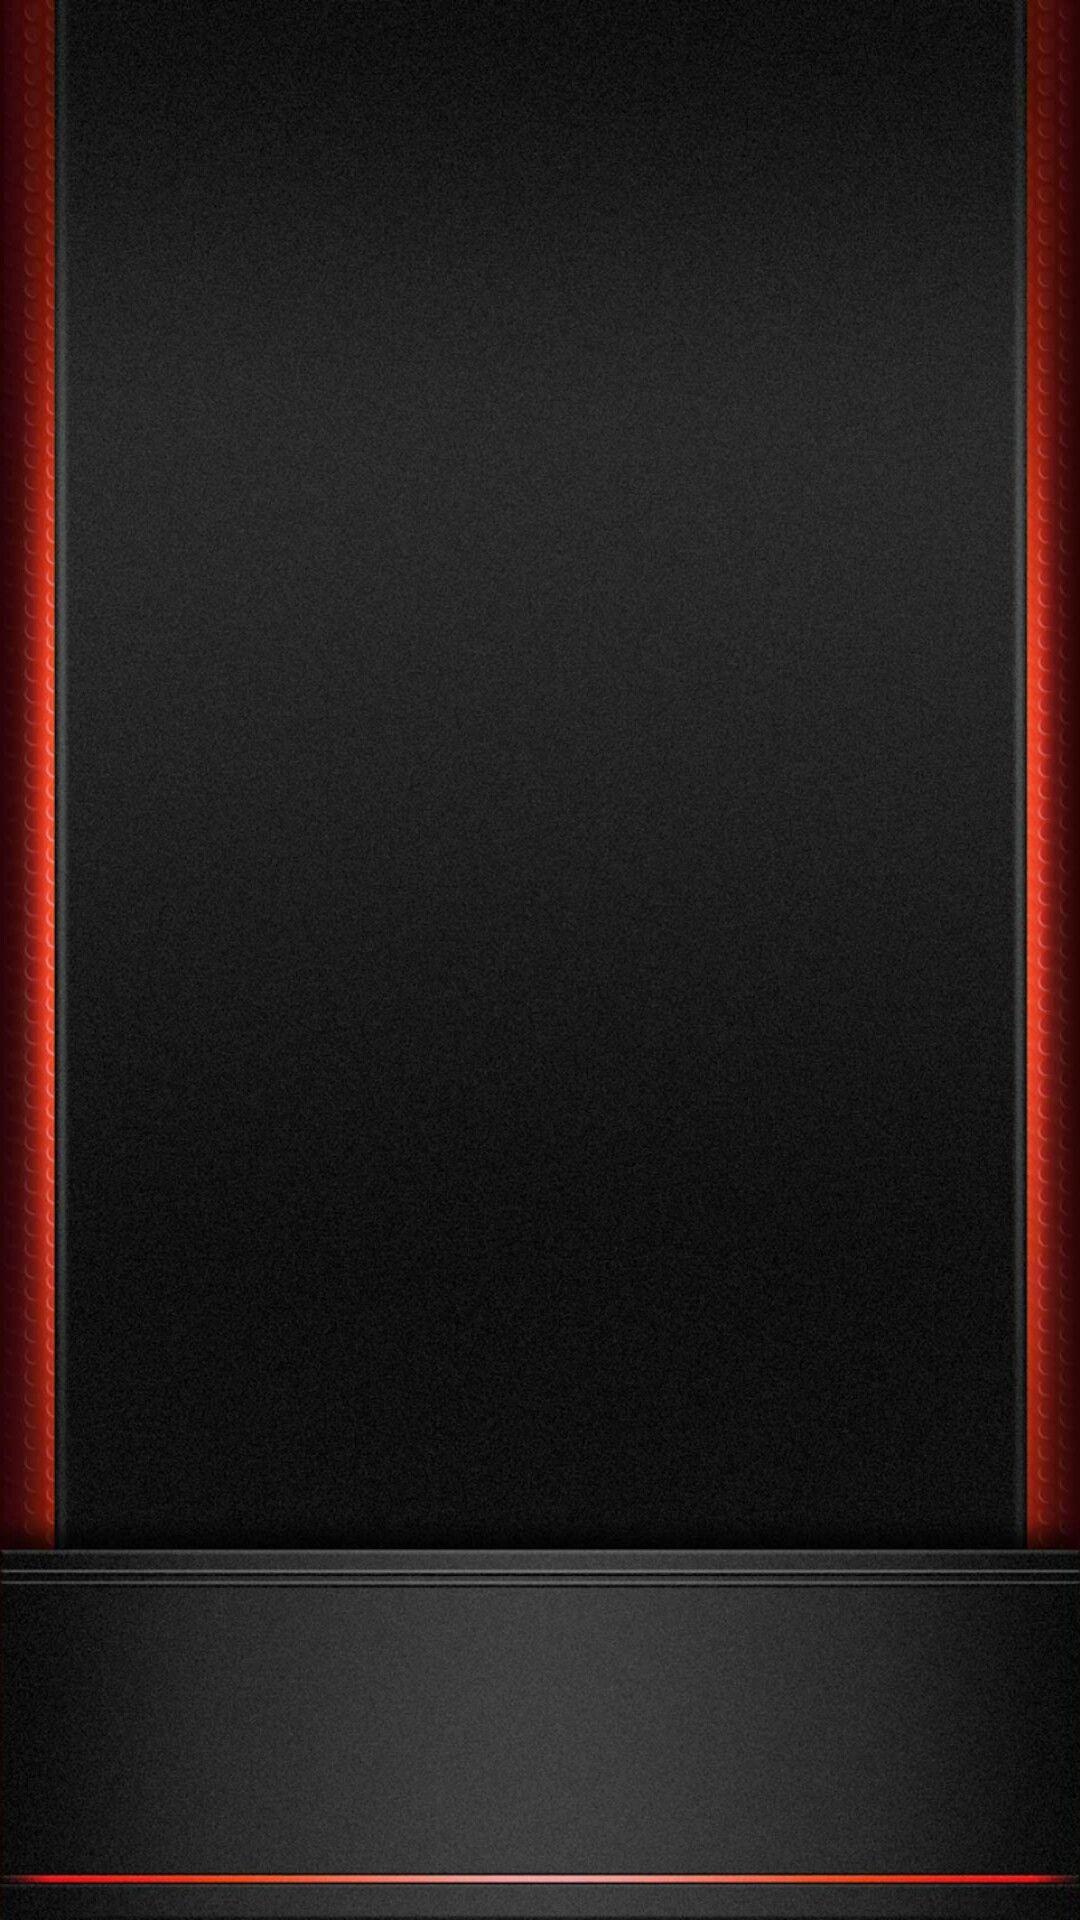 Black with Red Trim Wallpaper Black wallpaper, Supreme